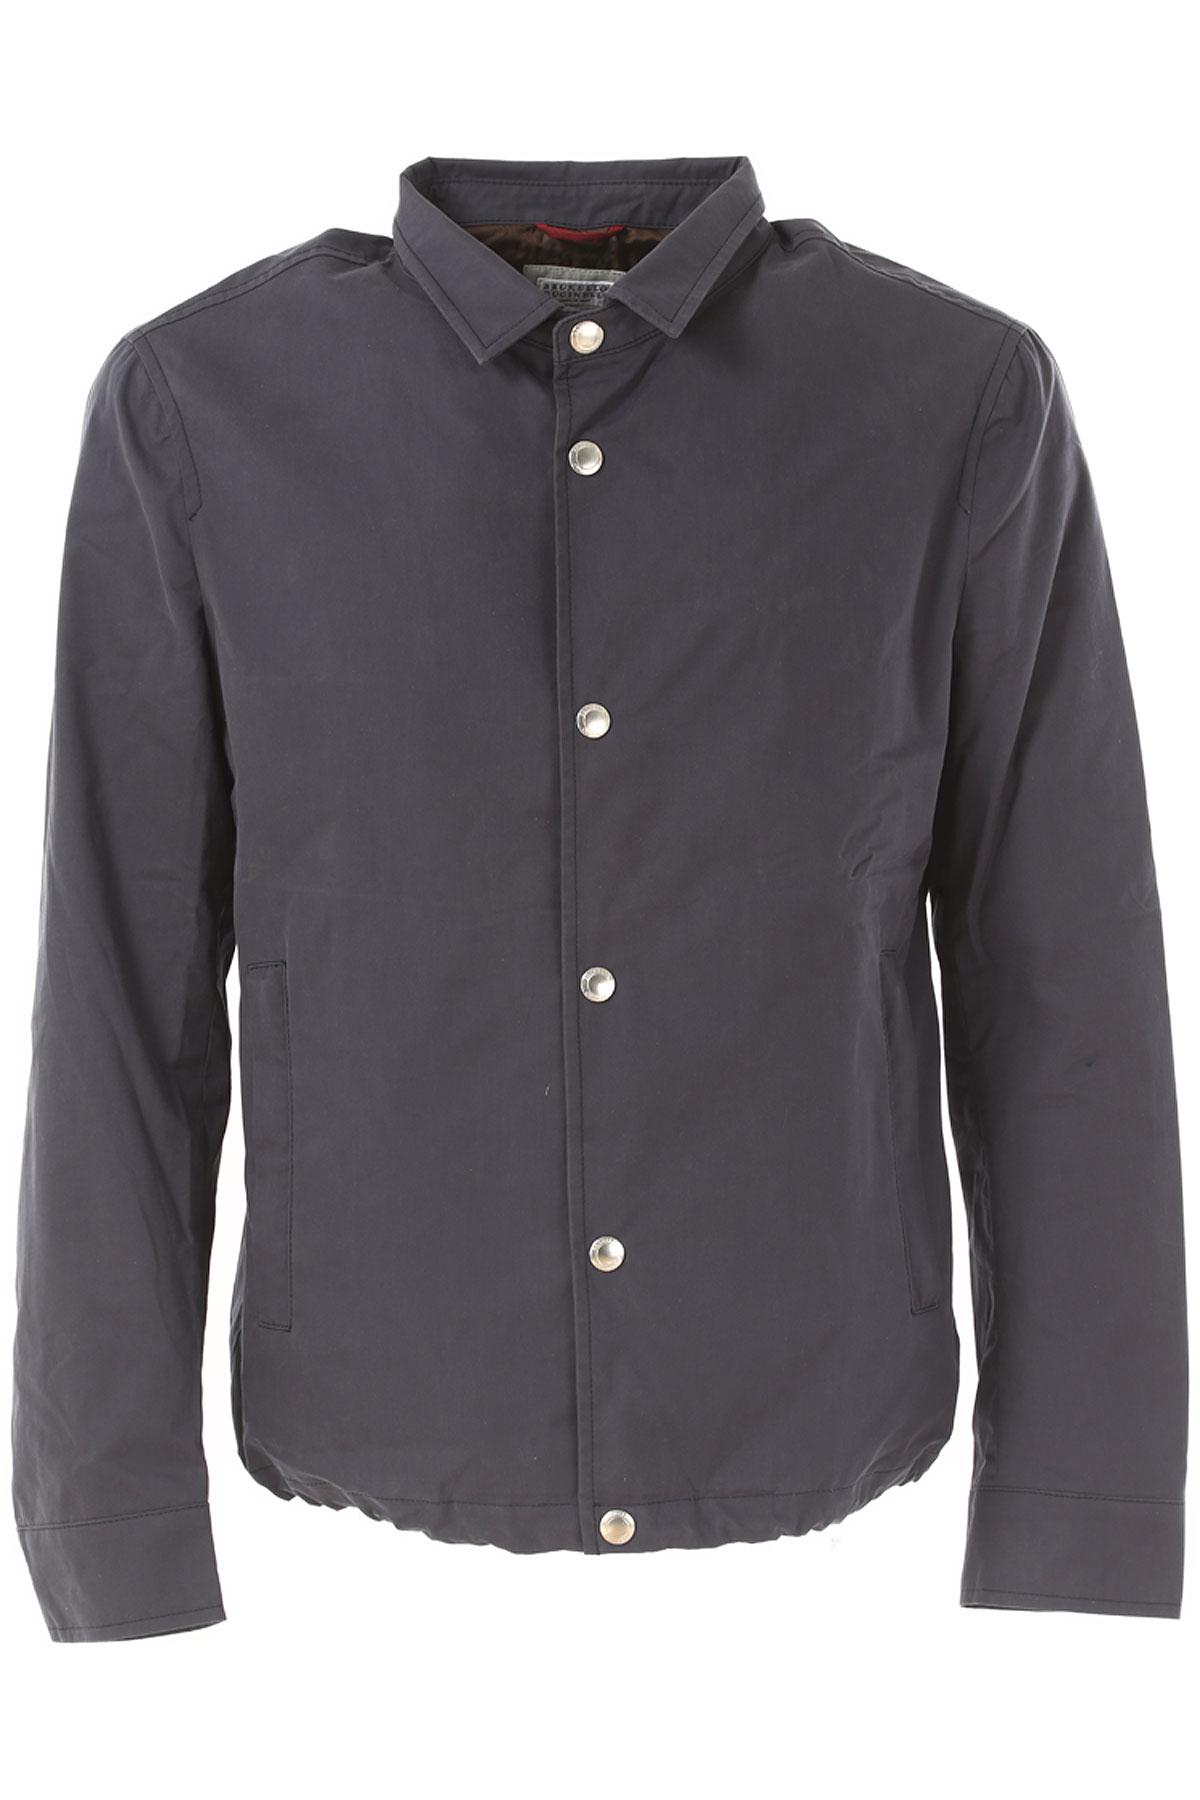 Image of Brunello Cucinelli Jacket for Men On Sale in Outlet, Blue, Cotton, 2017, L XL